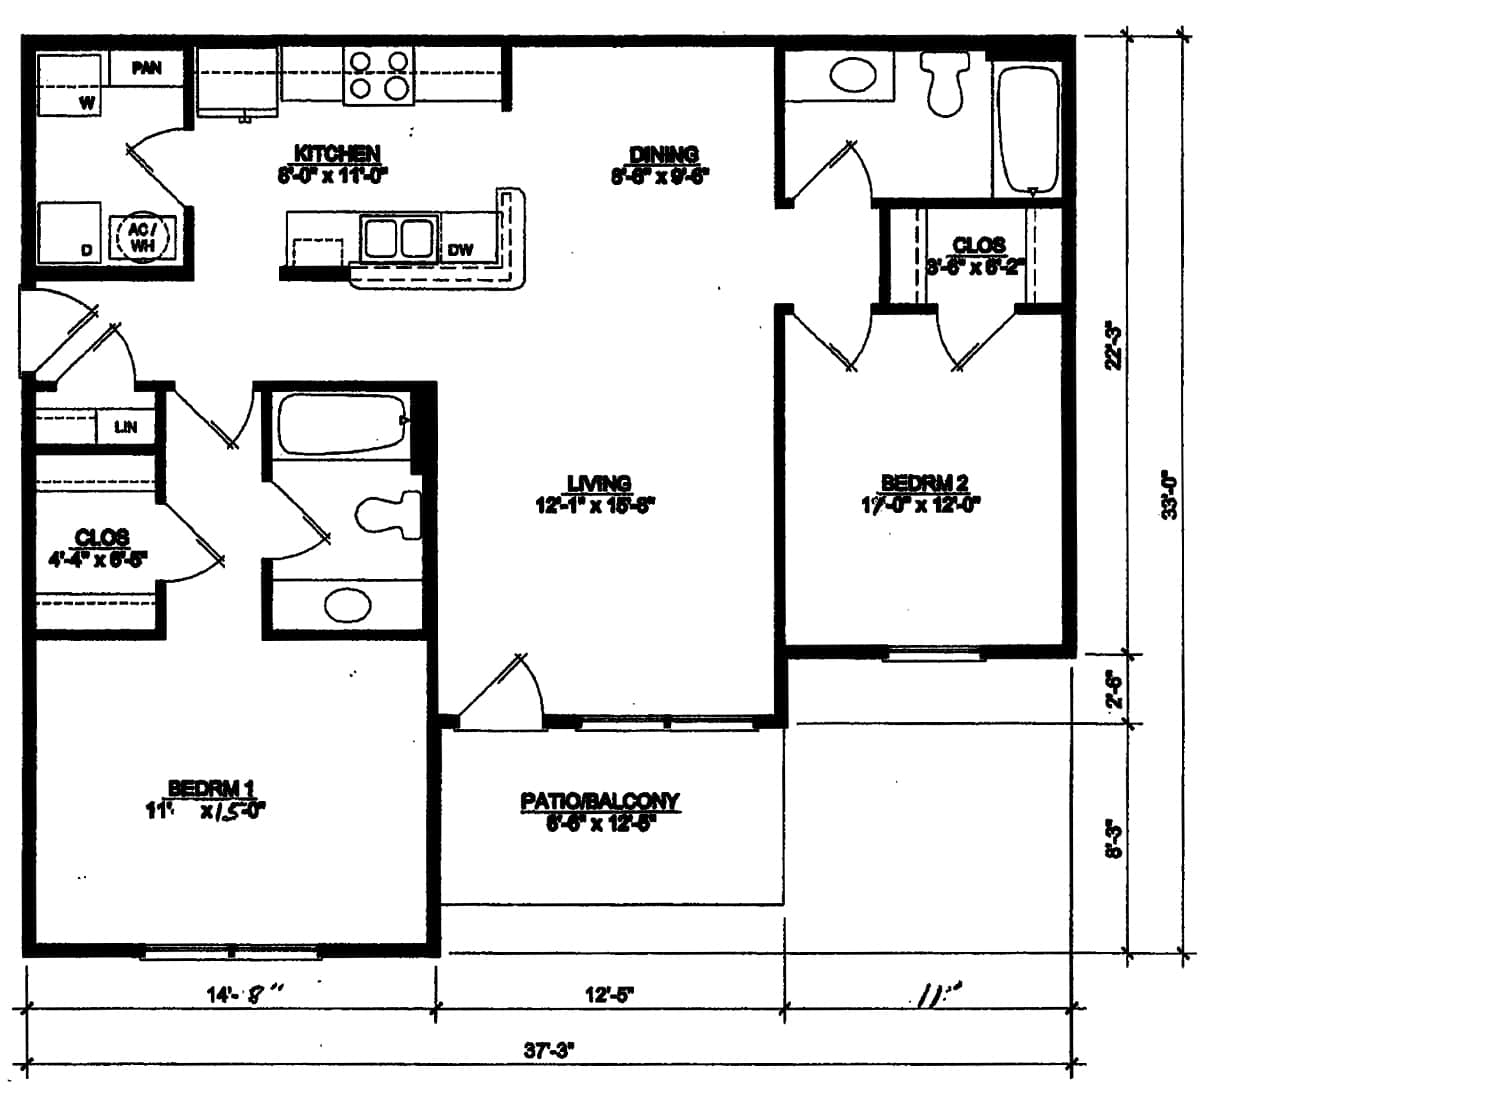 apartments | 2 bedroom apartment paducah | 2 bedroom apartment